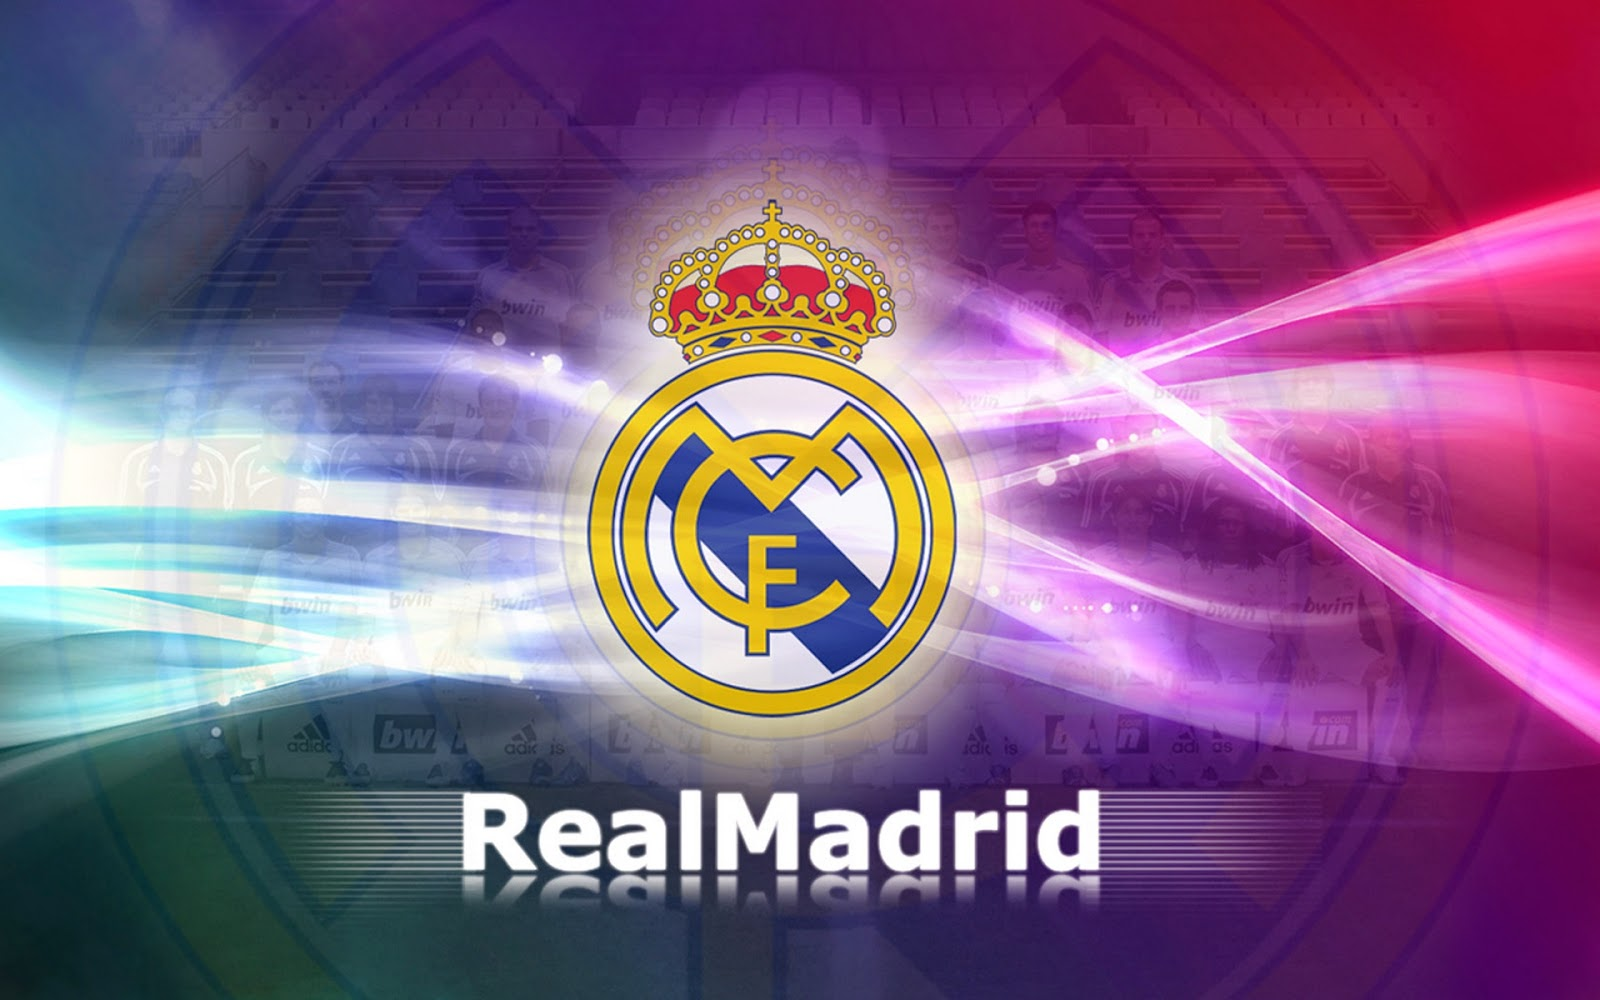 Real Madrid Football Club Wallpaper Football Wallpaper HD